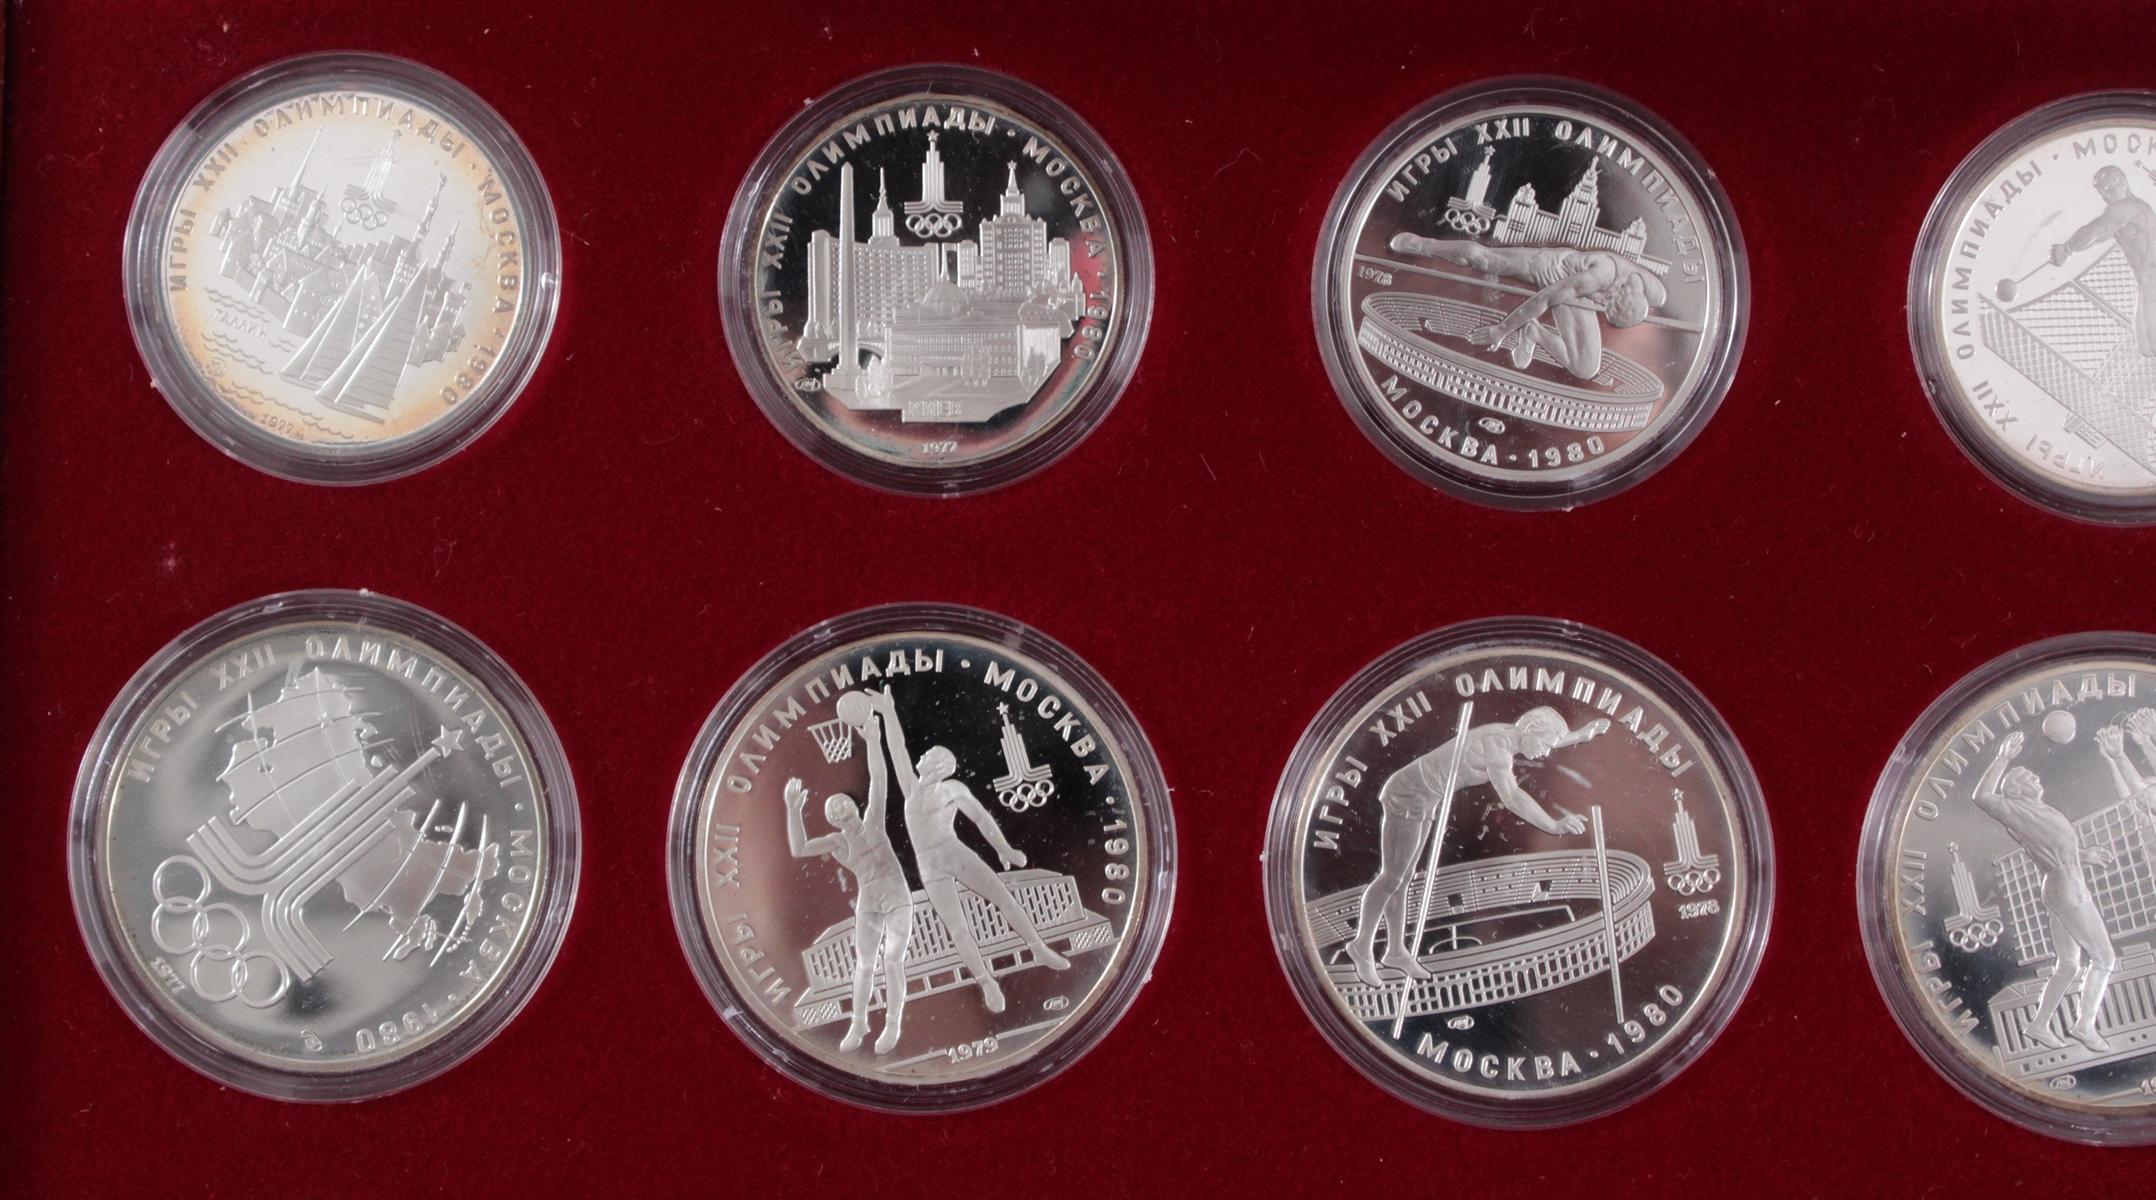 Russland, Olympiade Moskau 1980 in PP-2